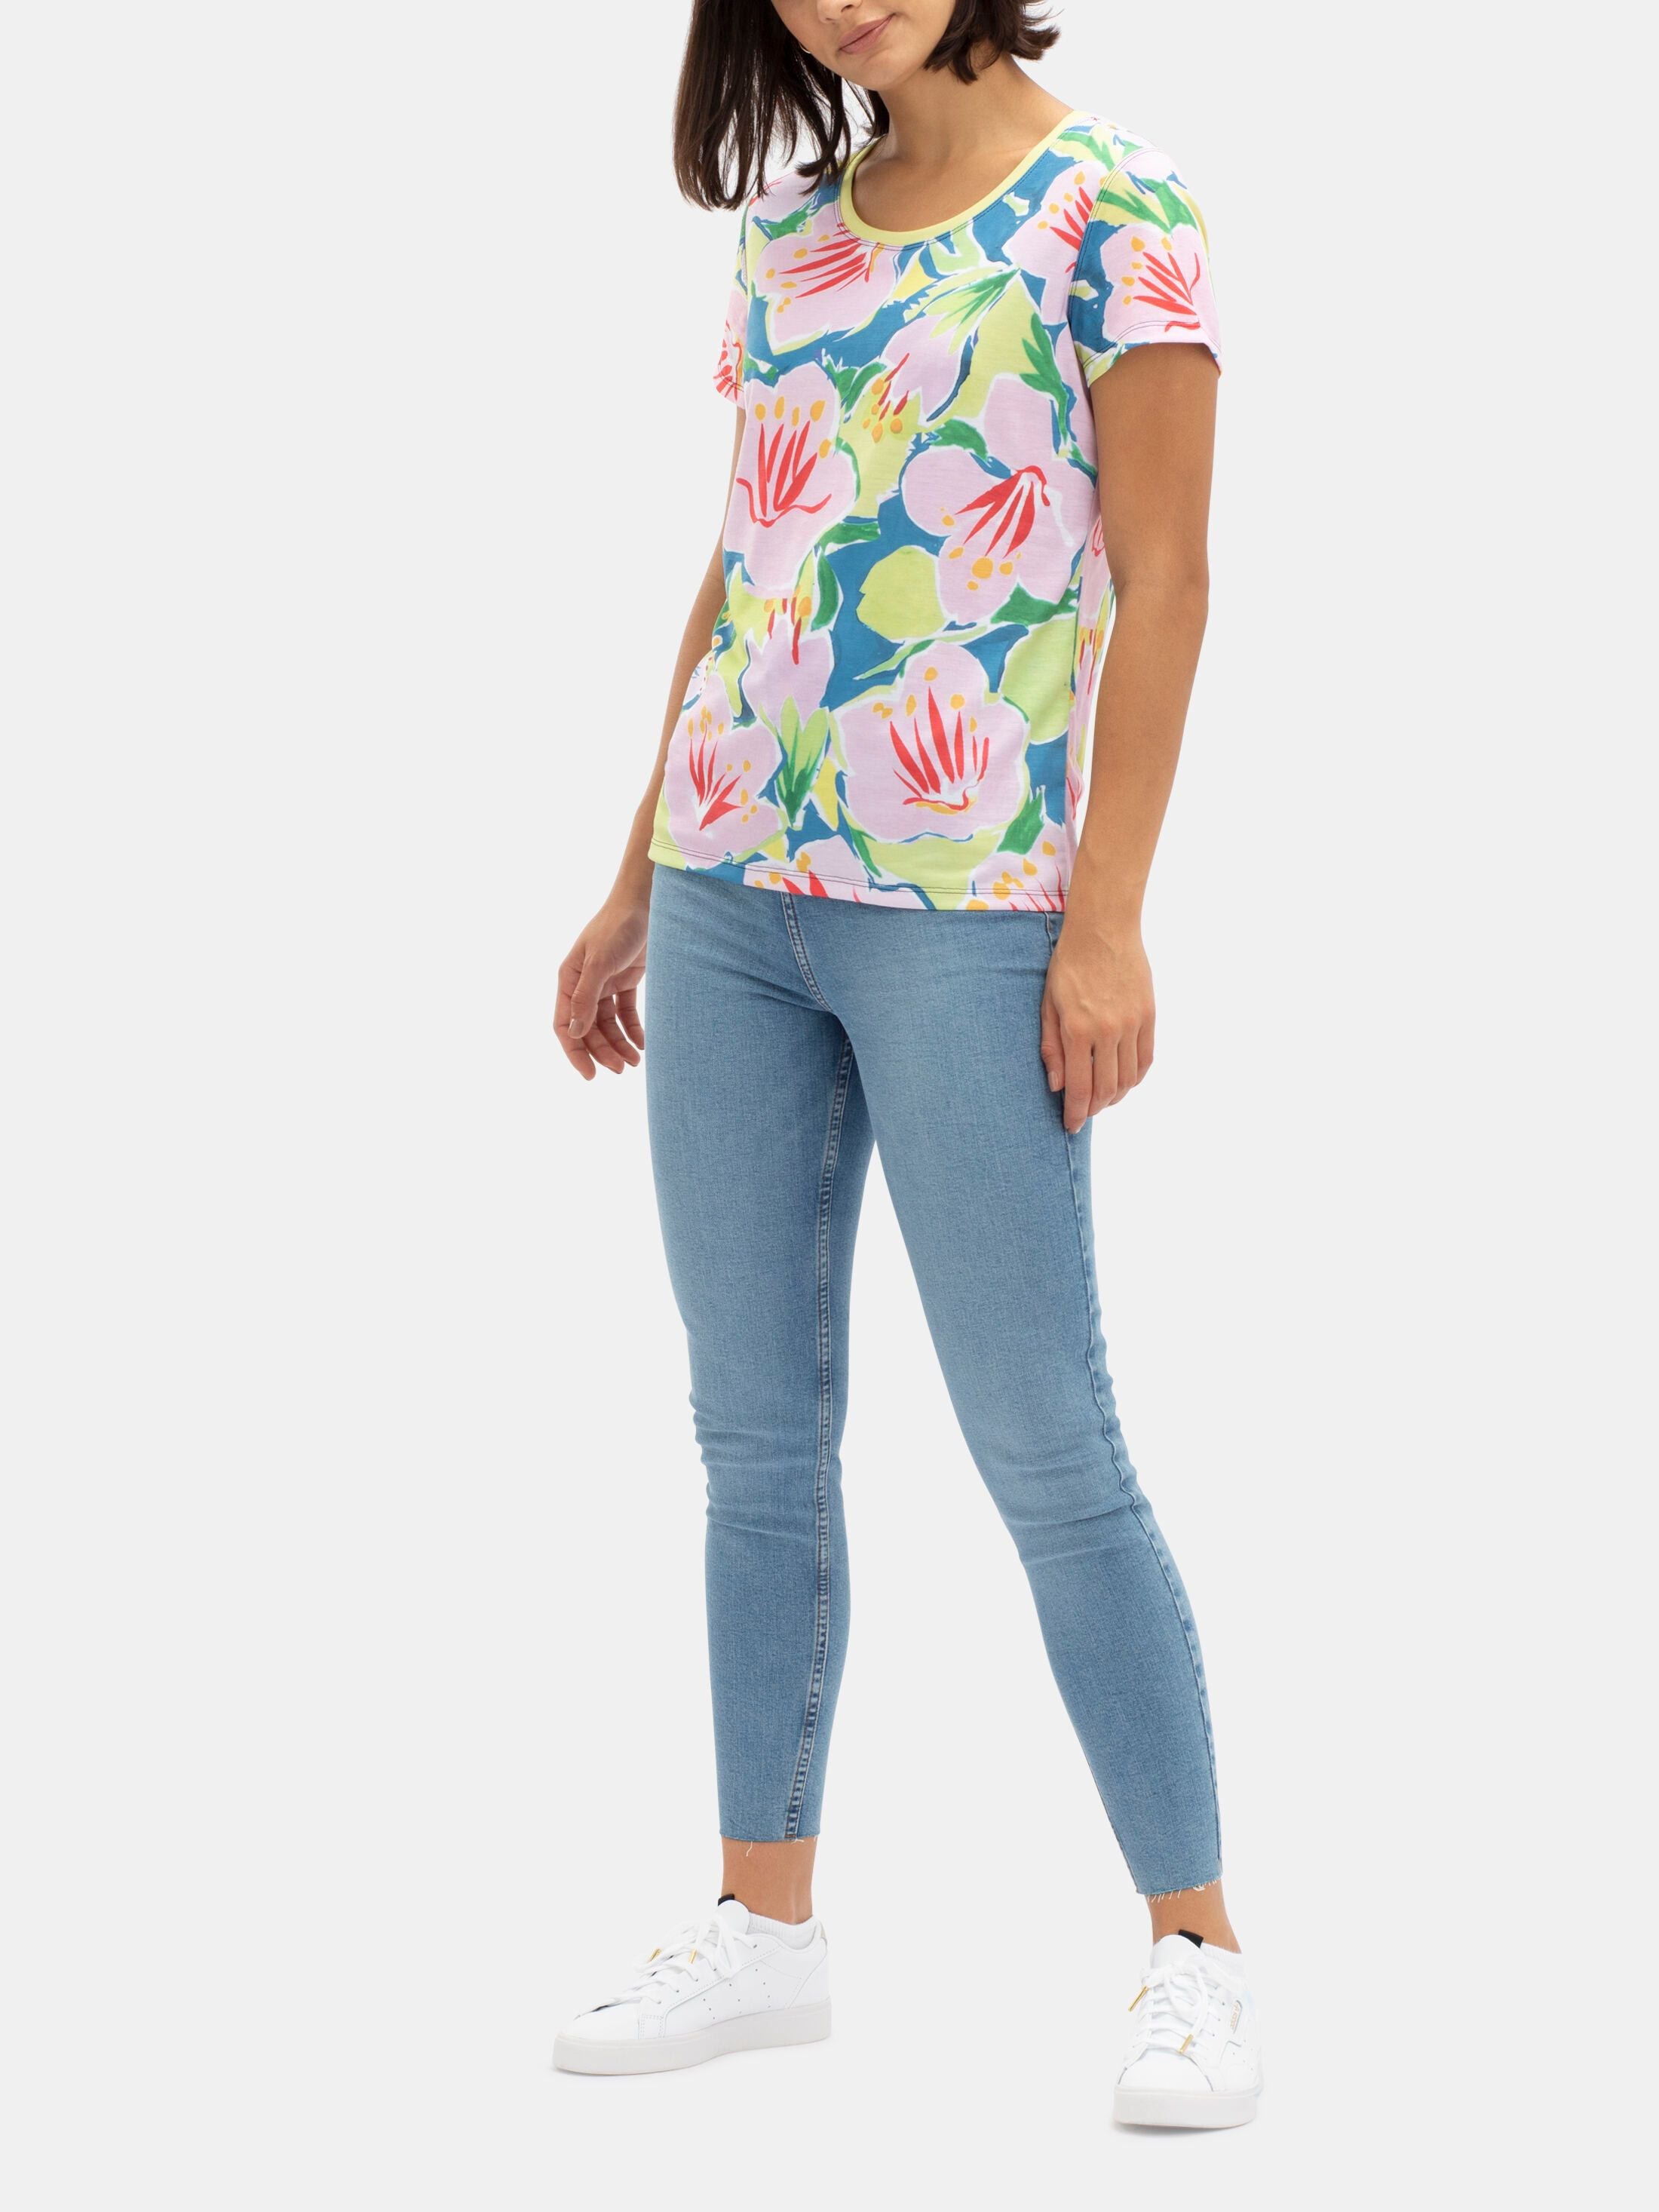 stretchy cotton fabric t-shirt